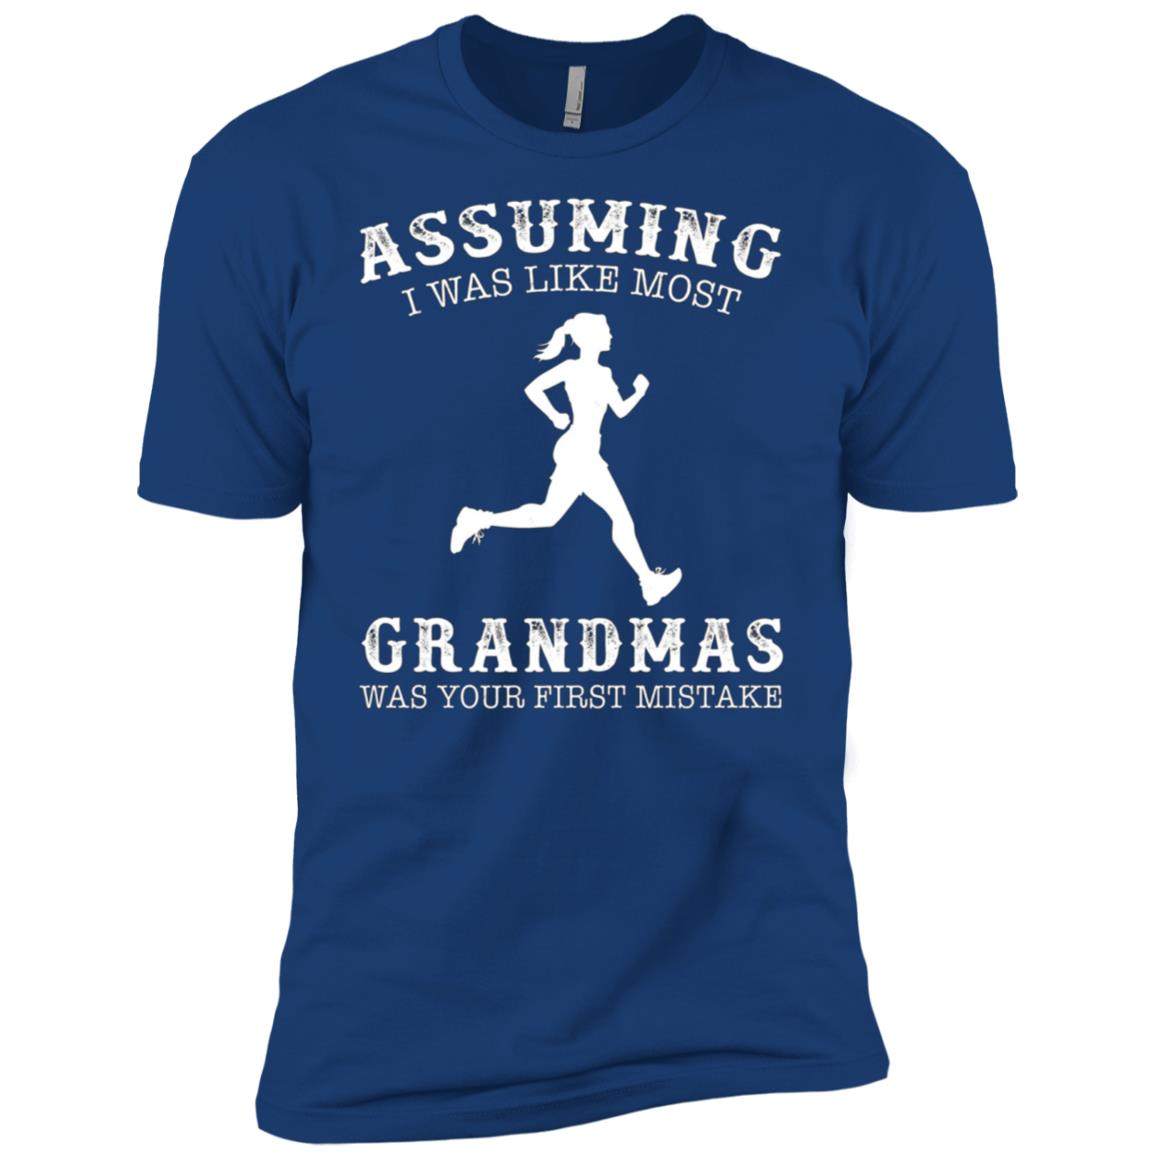 Assuming i was like most grandmas was first mistake Running Men Short Sleeve T-Shirt